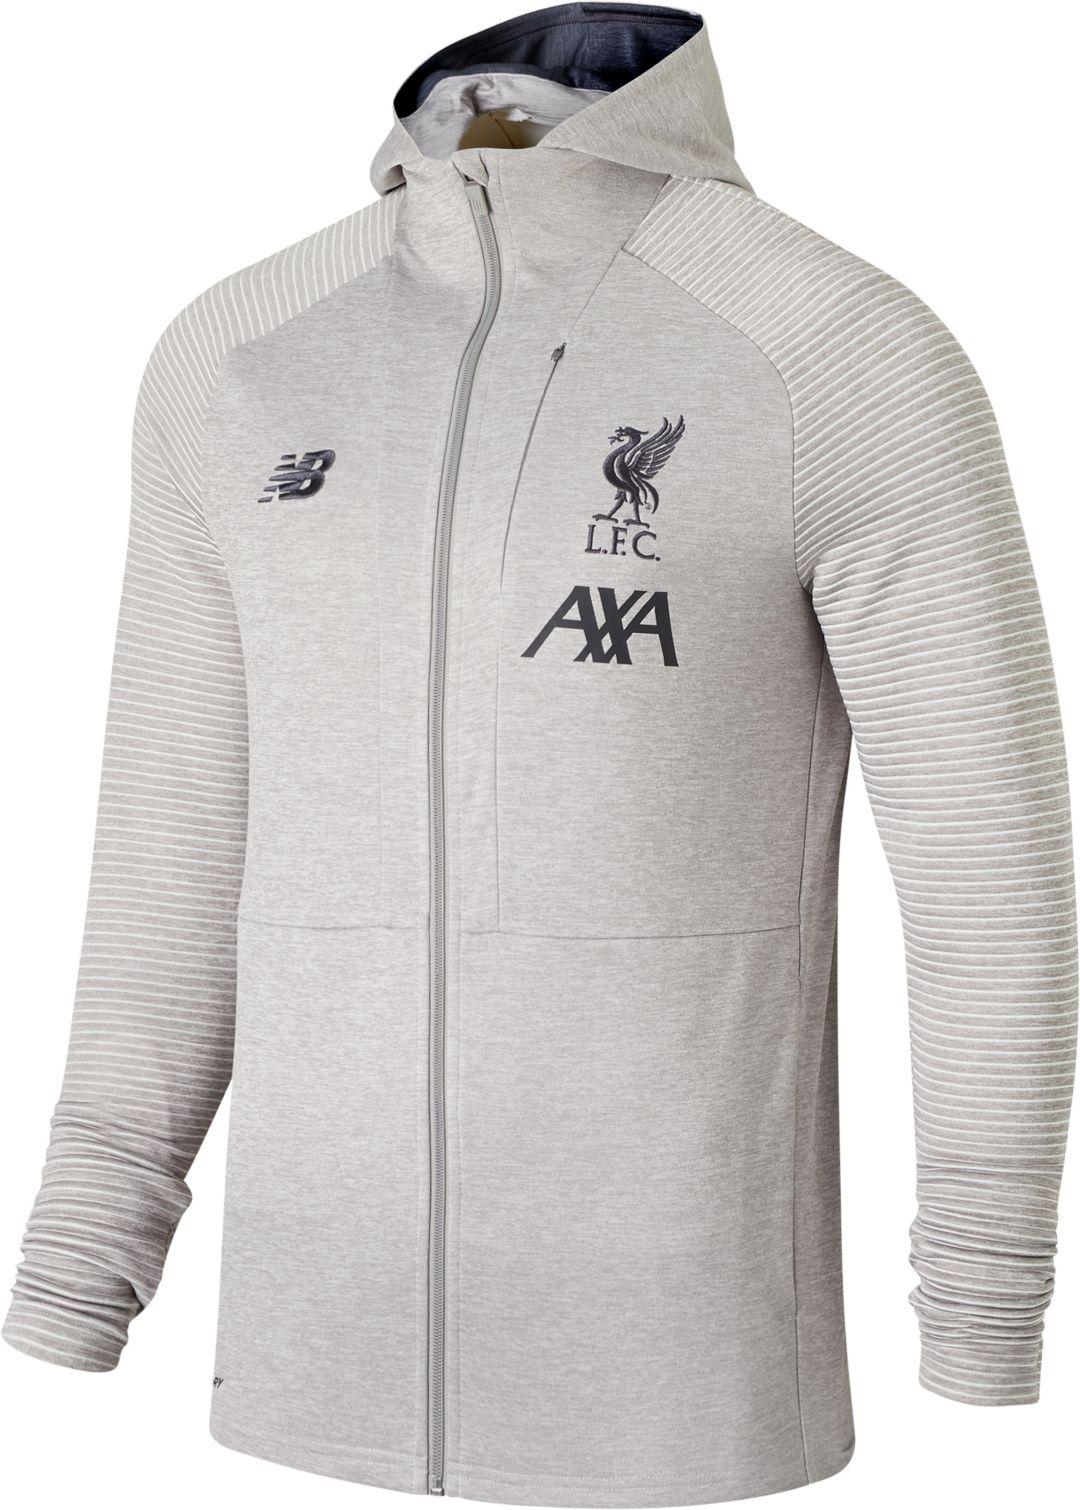 1106275cd7aec New Balance Men's Liverpool FC Travel Heather Grey Full-Zip Jacket.  noImageFound. Previous